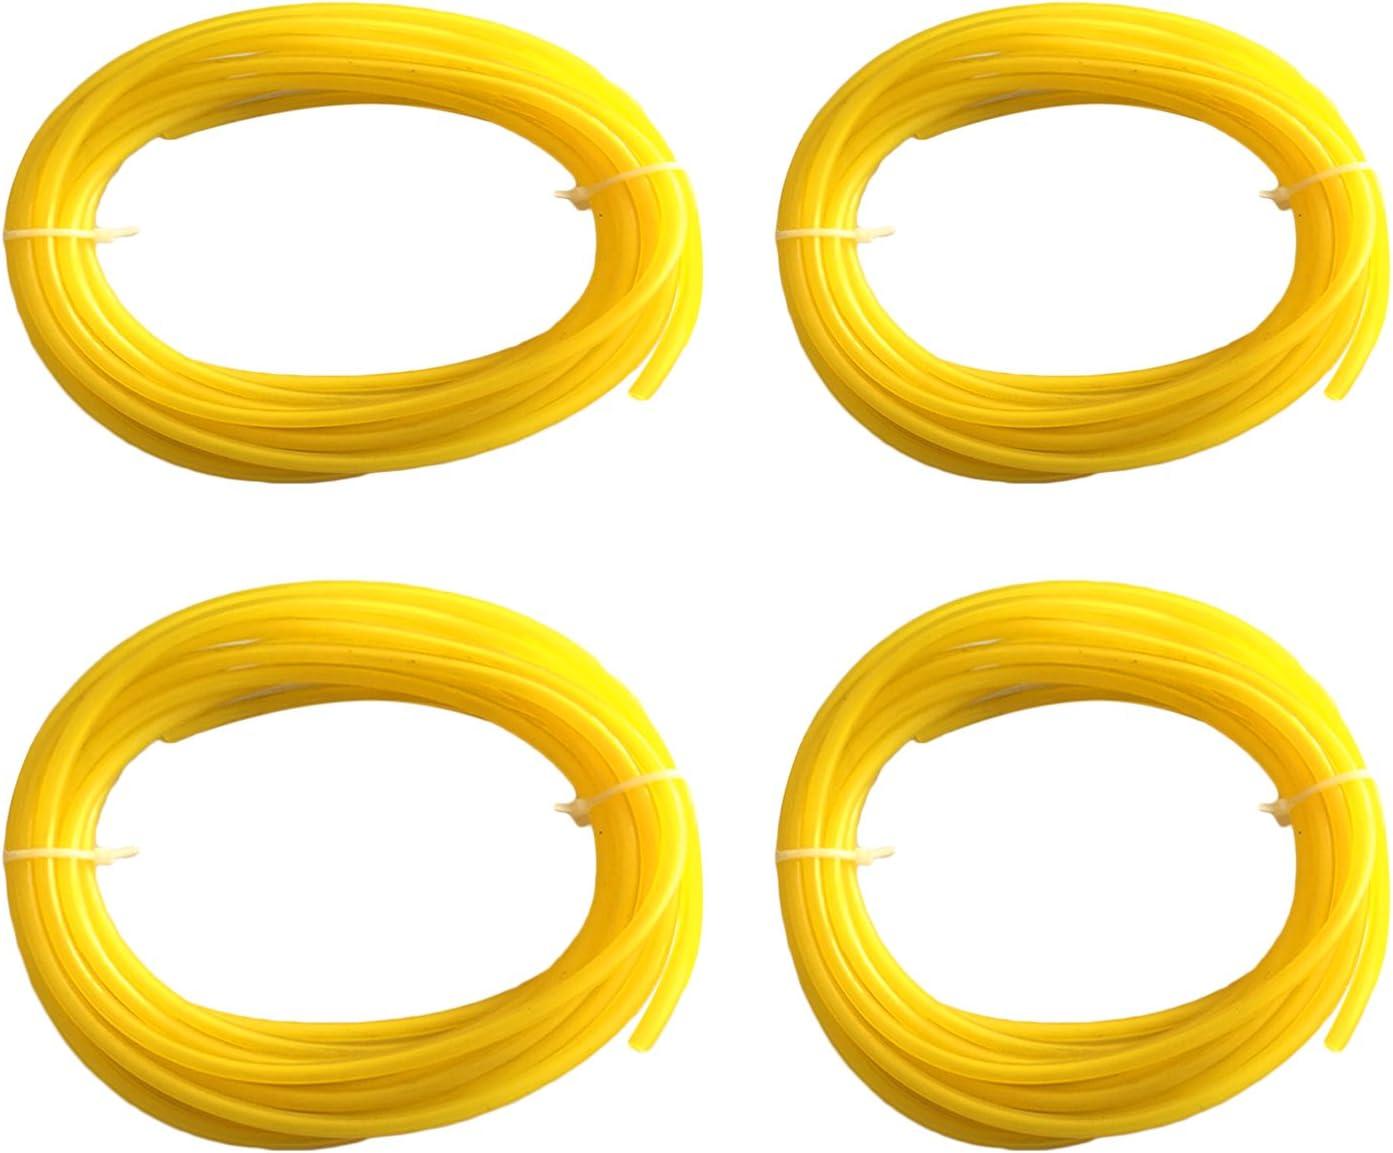 Gosear 4 PCS 4 Tama/ño 1m Long Petrol Fuel Line Tubo de Manguera para Craftman Chainsaw String Trimmer Blower